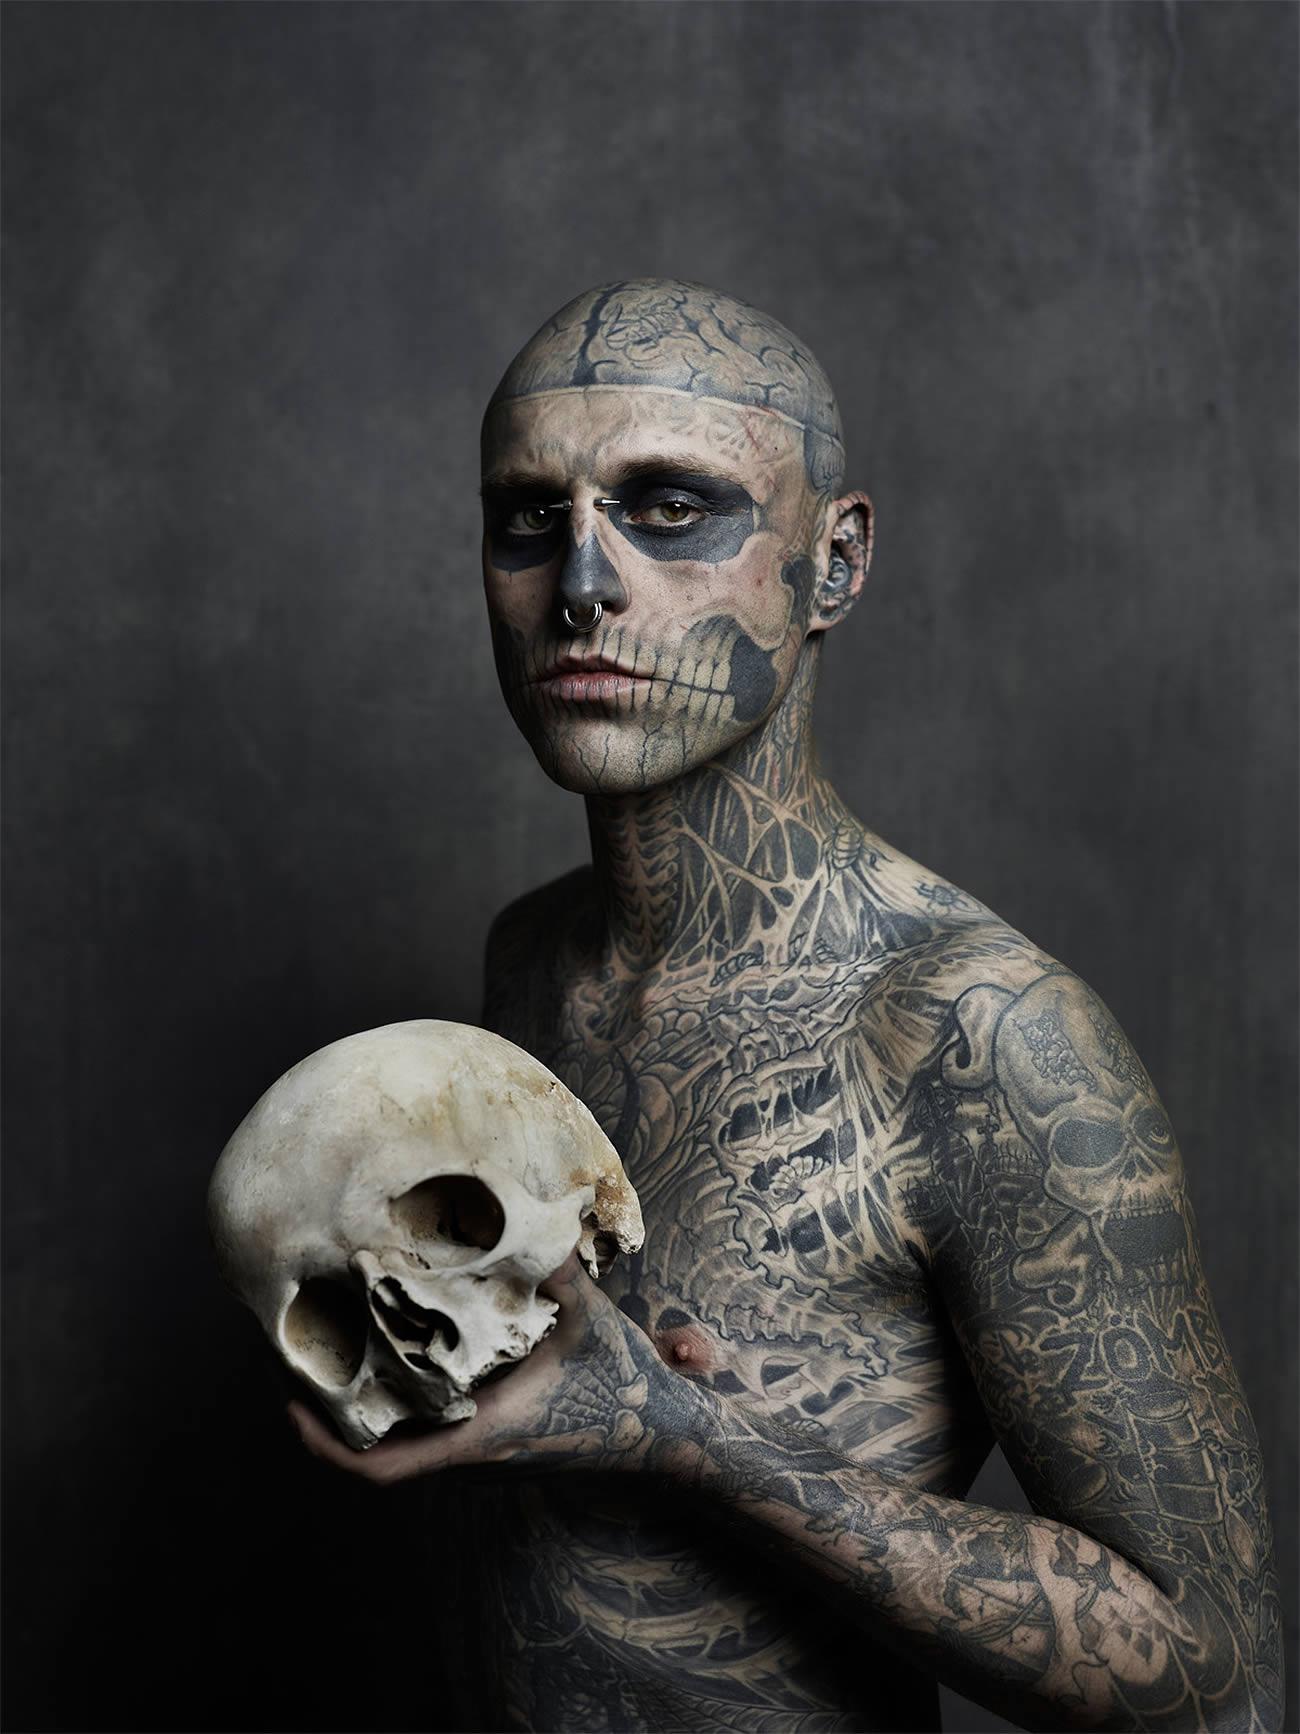 dali-skull-art-13